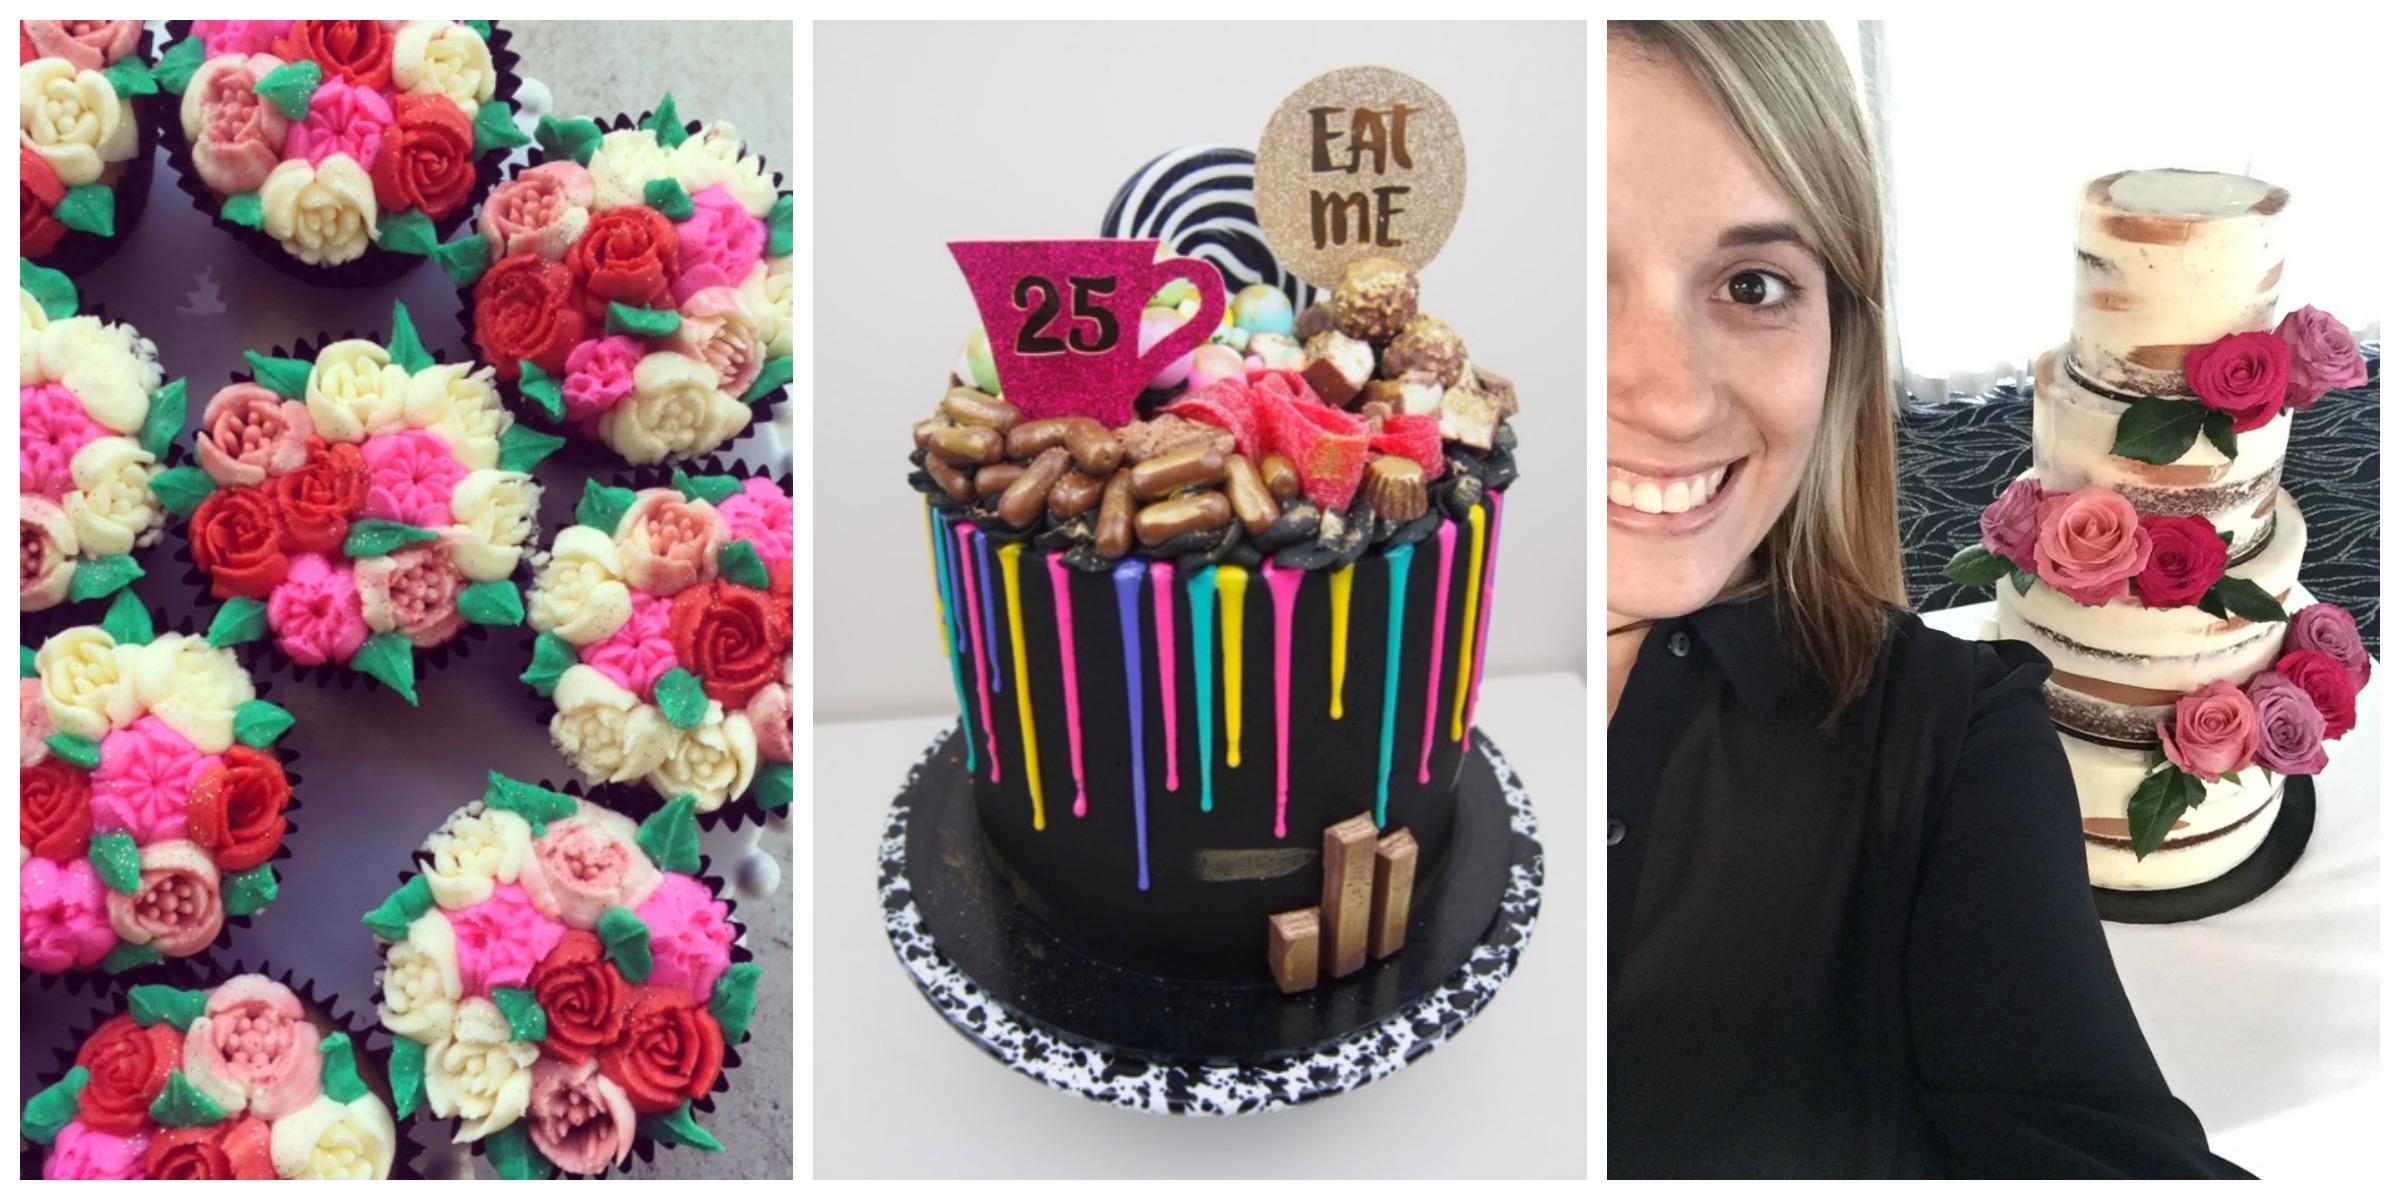 Karlee's Kupcakes: the cake and Instagram queen dominating Brisbane's celebration scene.